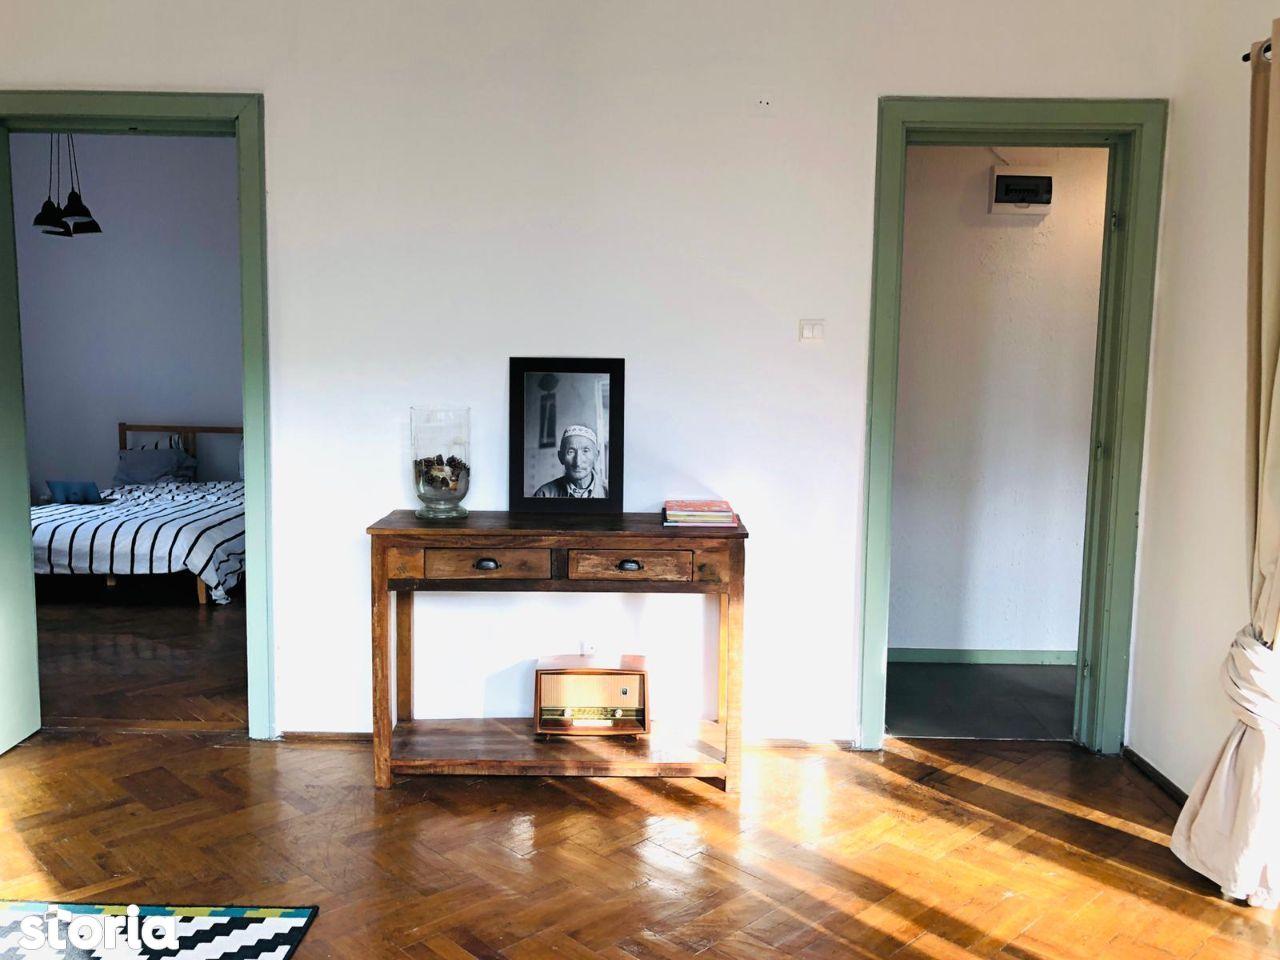 Proprietar, inchiriez apartament 3 camere Cotroceni, Sf. Elefterie